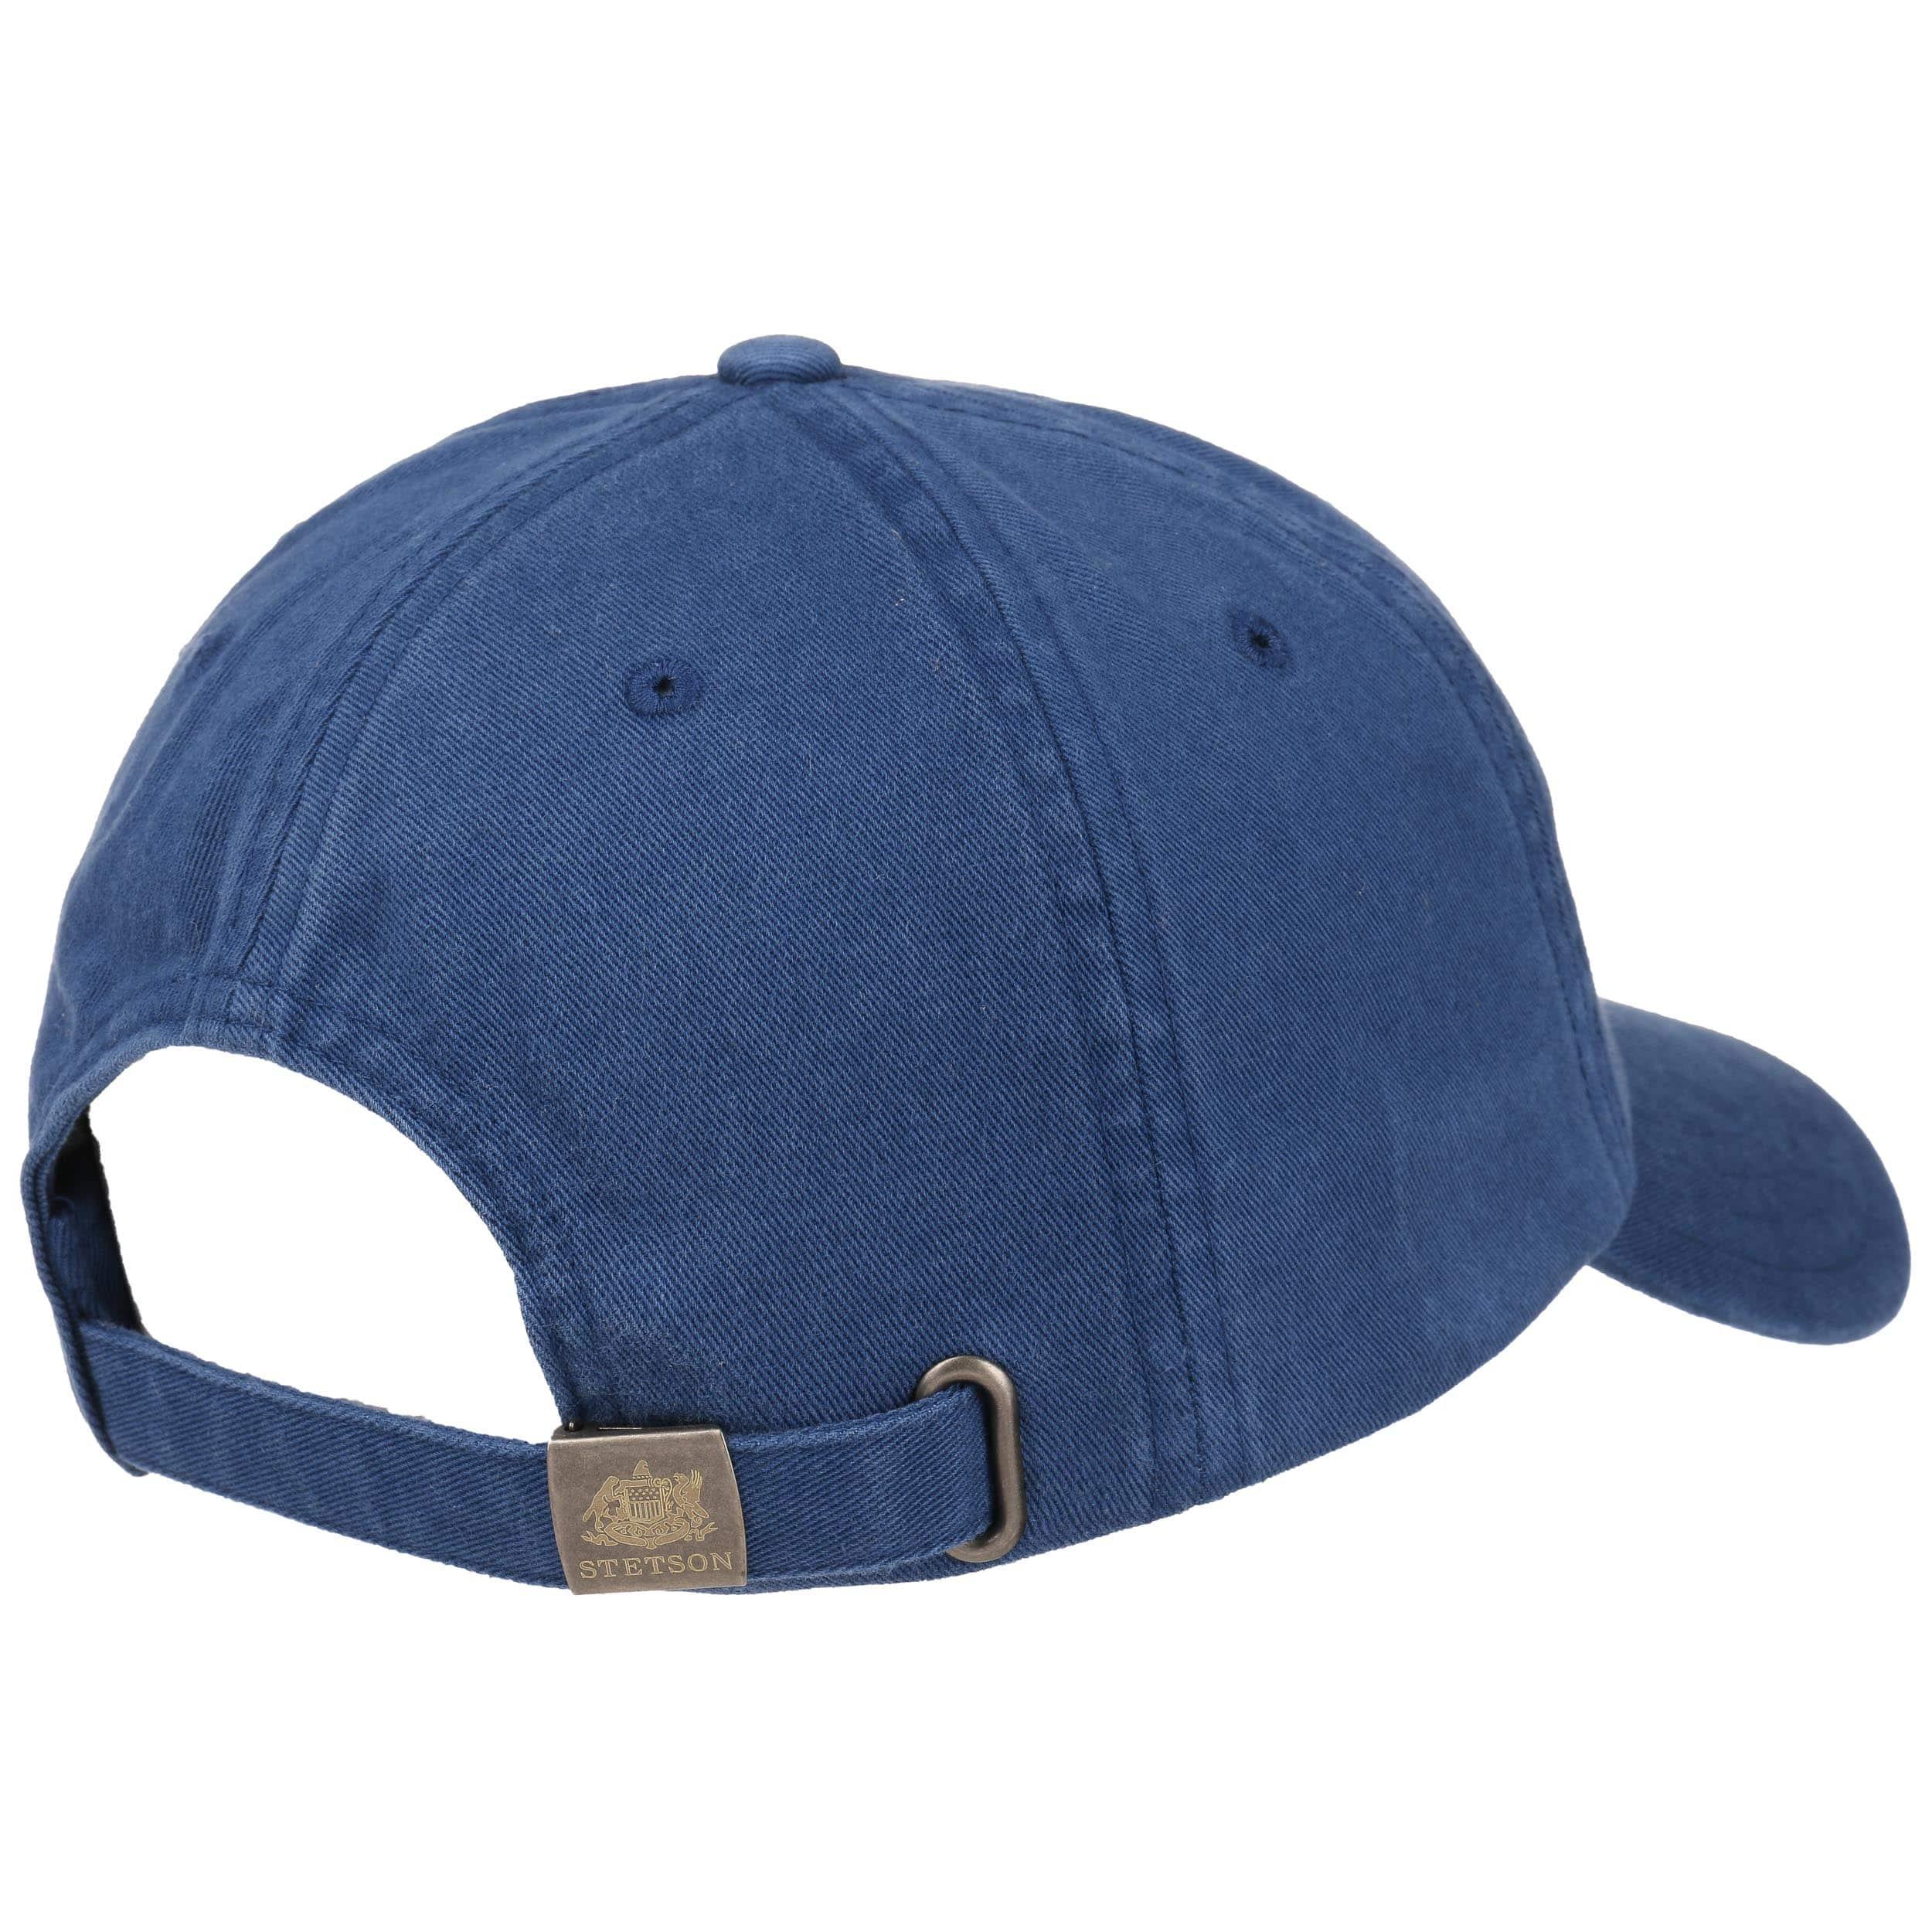 ... Rector Baseball Cap by Stetson - blue 3 ... 27e6477c70c